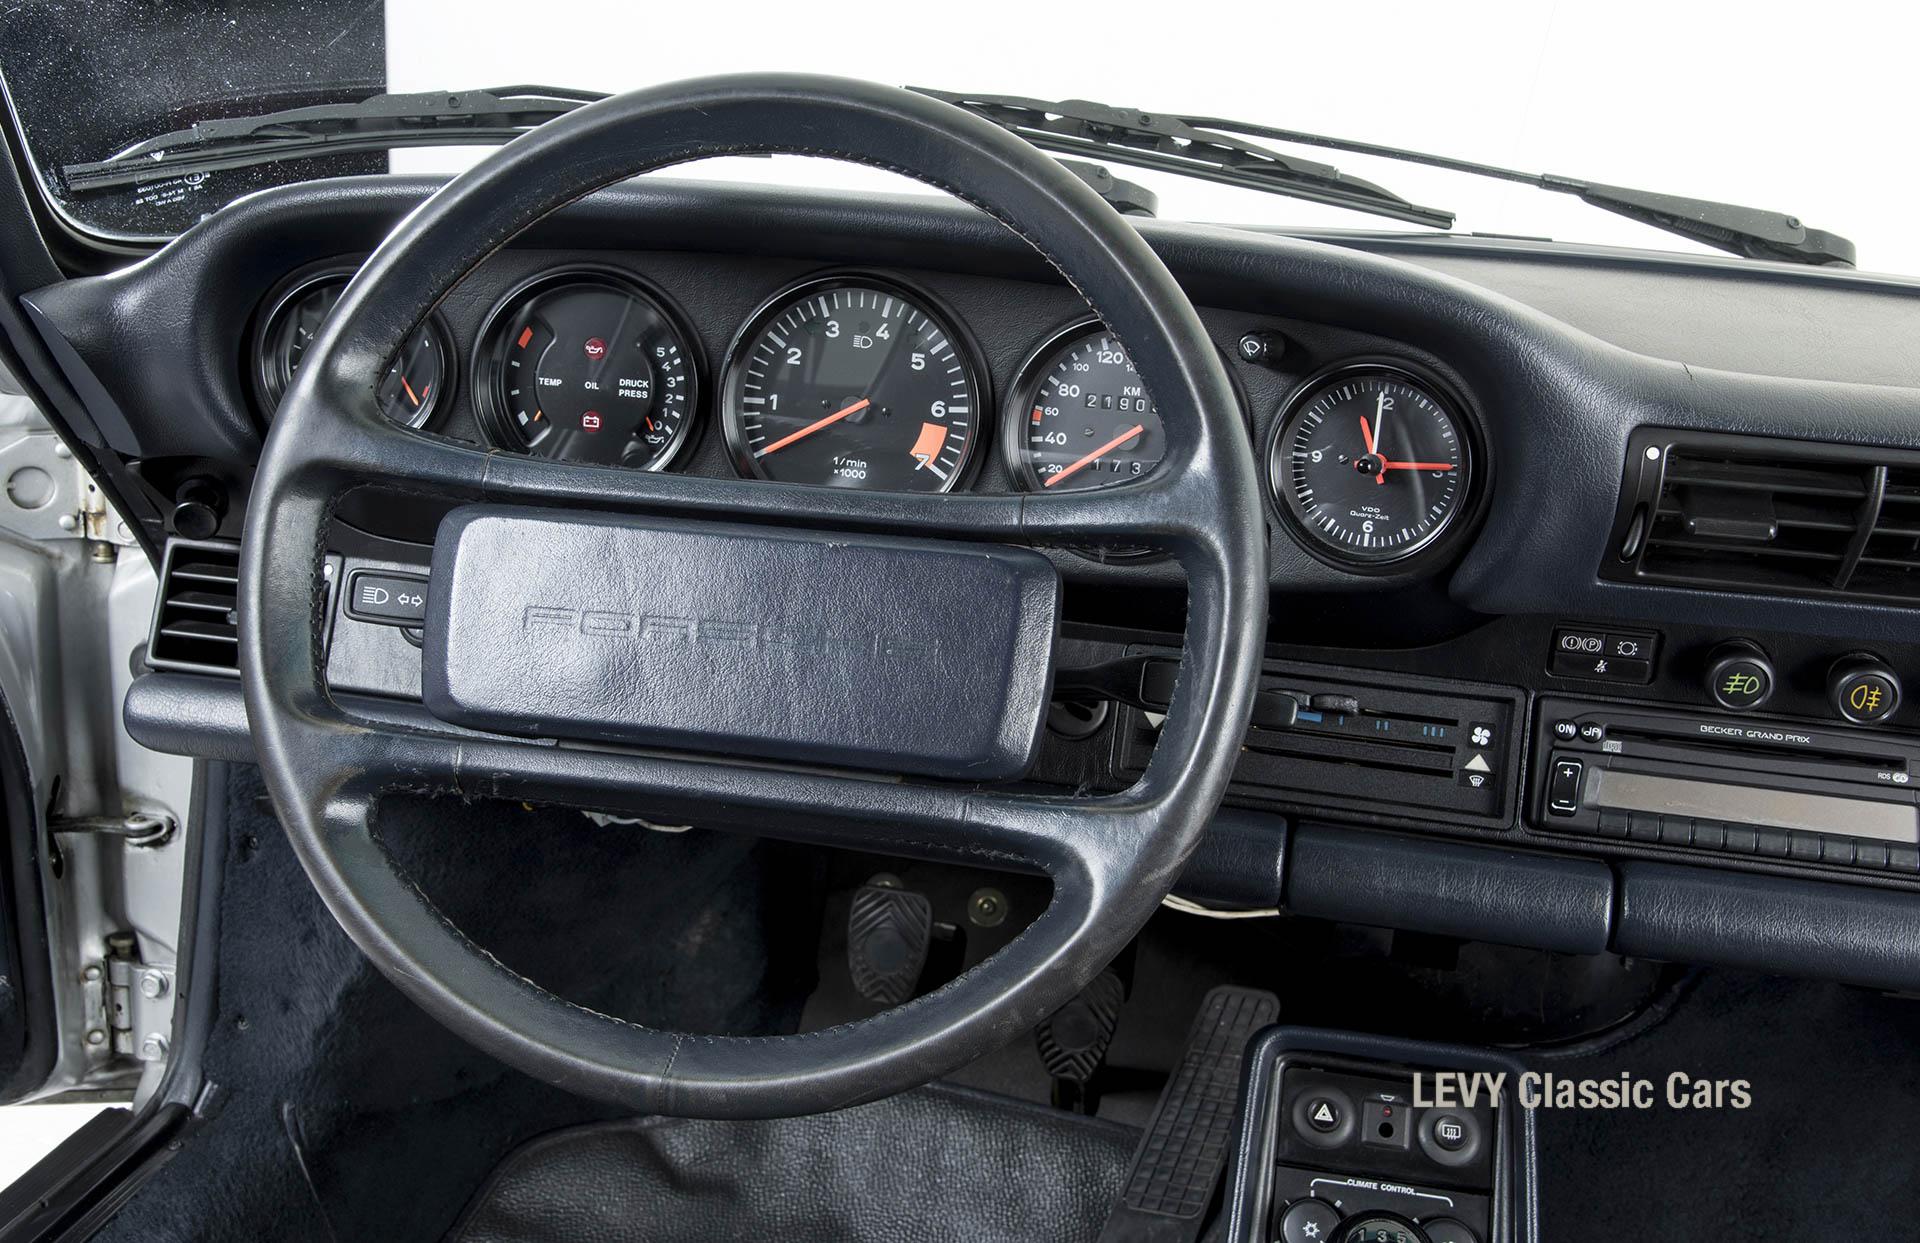 Porsche 911 C silber 03809 48